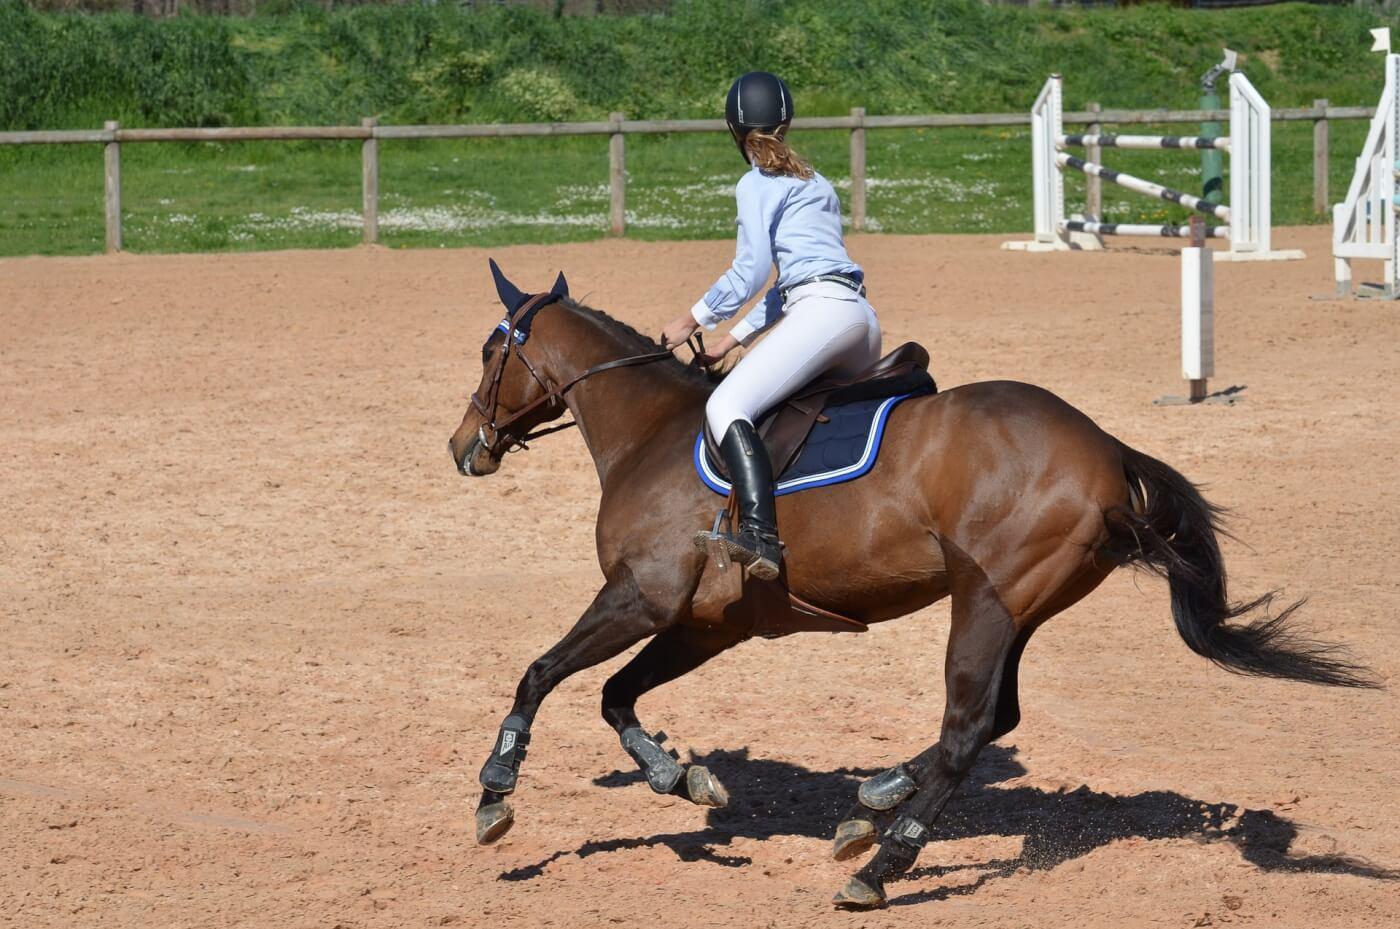 PETA Prime: Why My Love of Horses Made Me Give Up Horseback